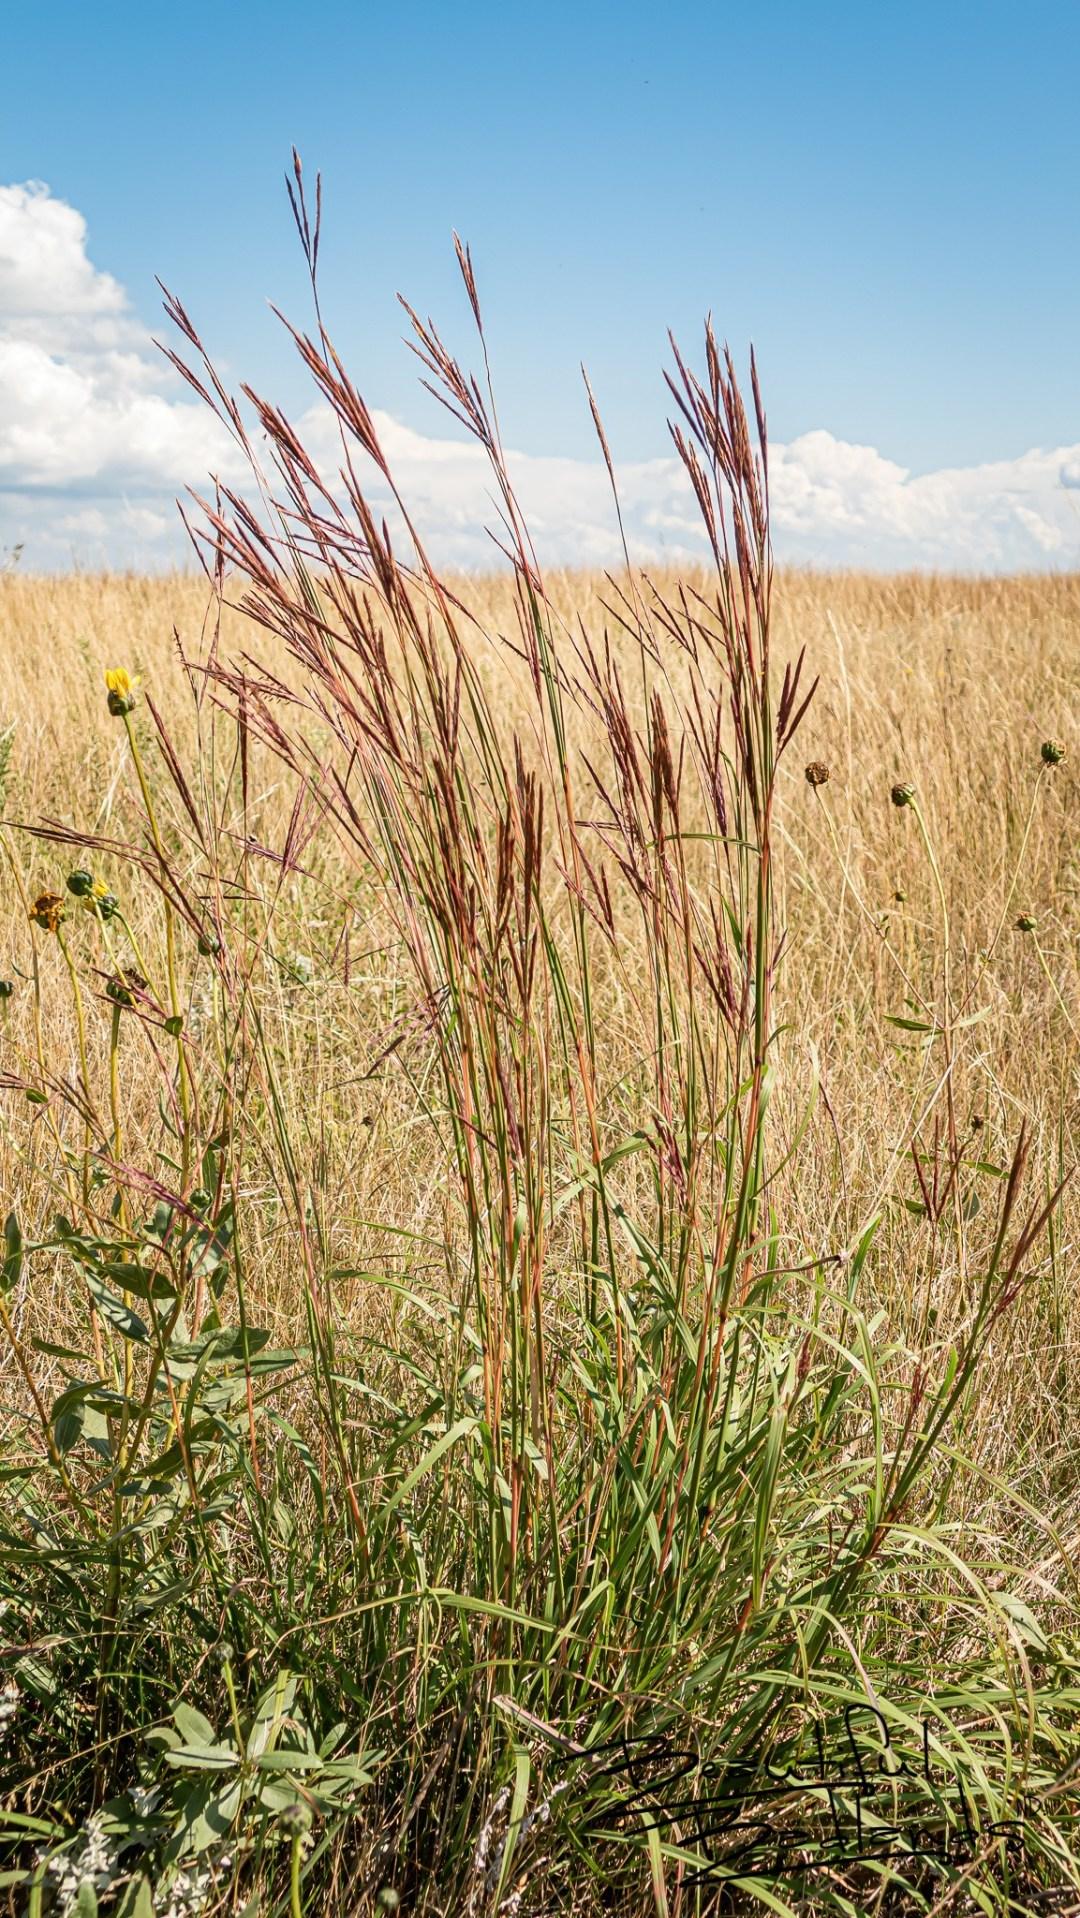 Prairie June Grass Dots the Landscape Above Good Bear Bay at Indian Hills Recreation Area, North Dakota